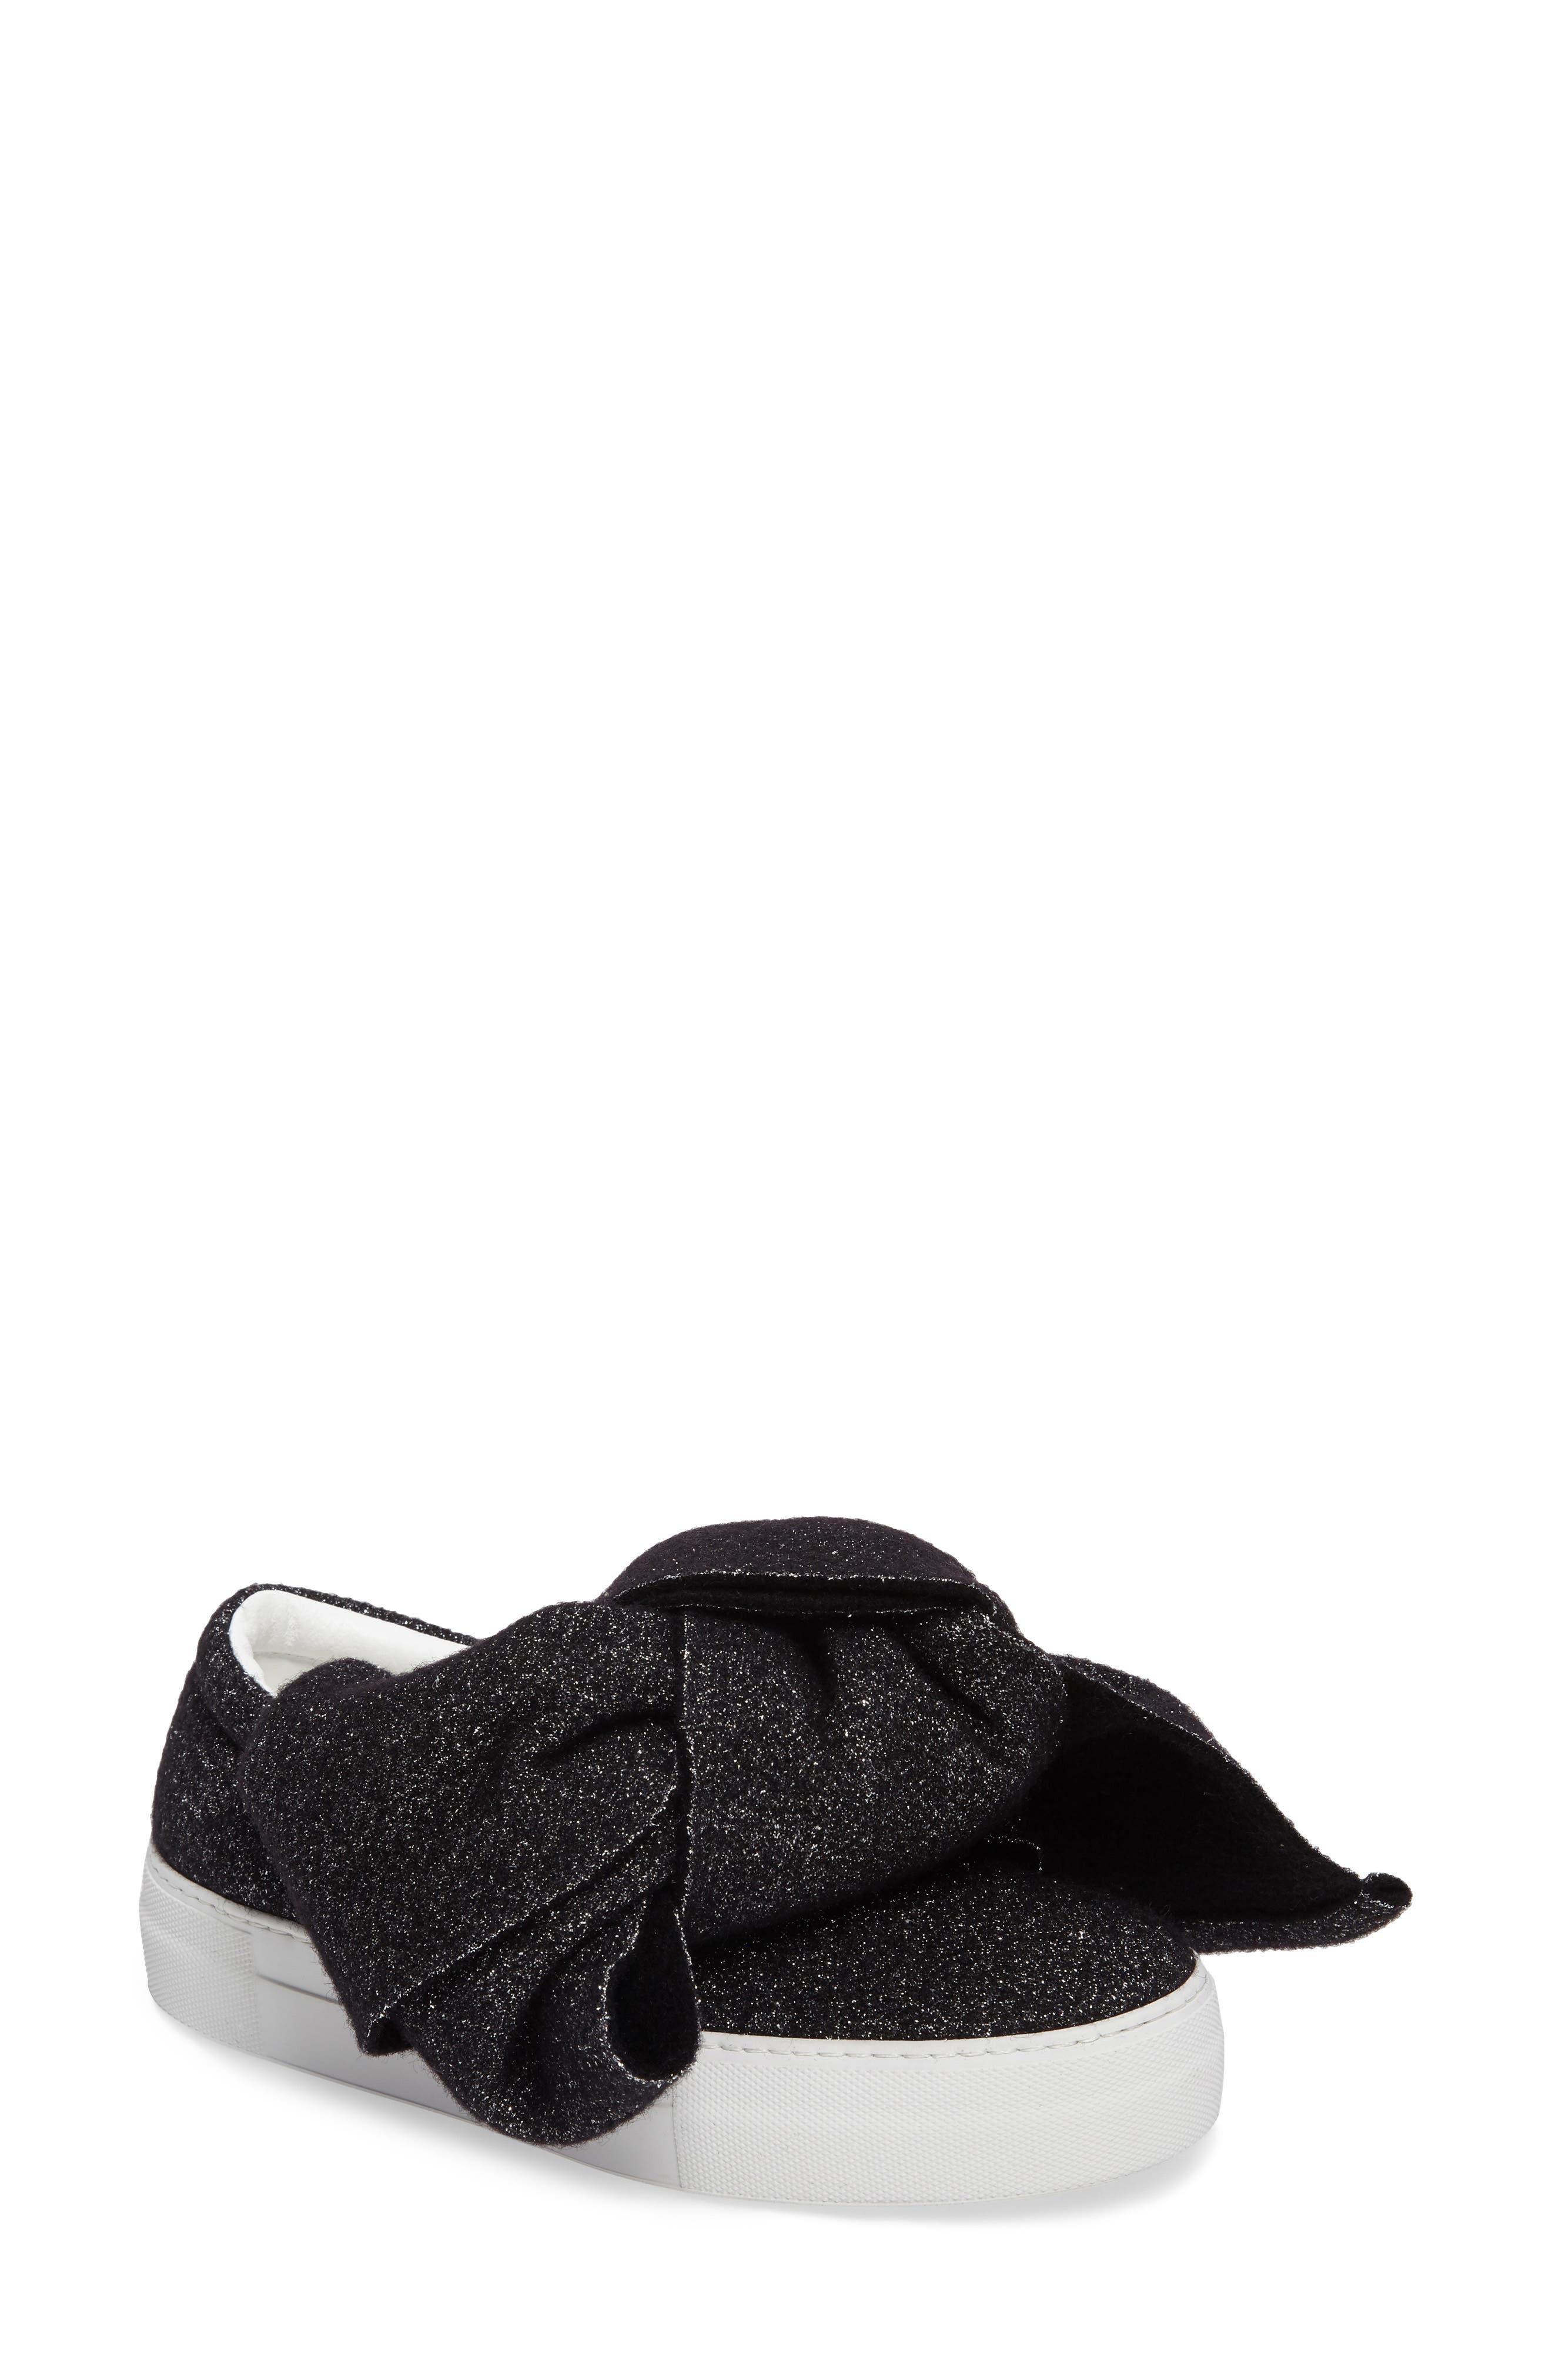 Bow Slip-On Sneaker,                             Main thumbnail 1, color,                             001